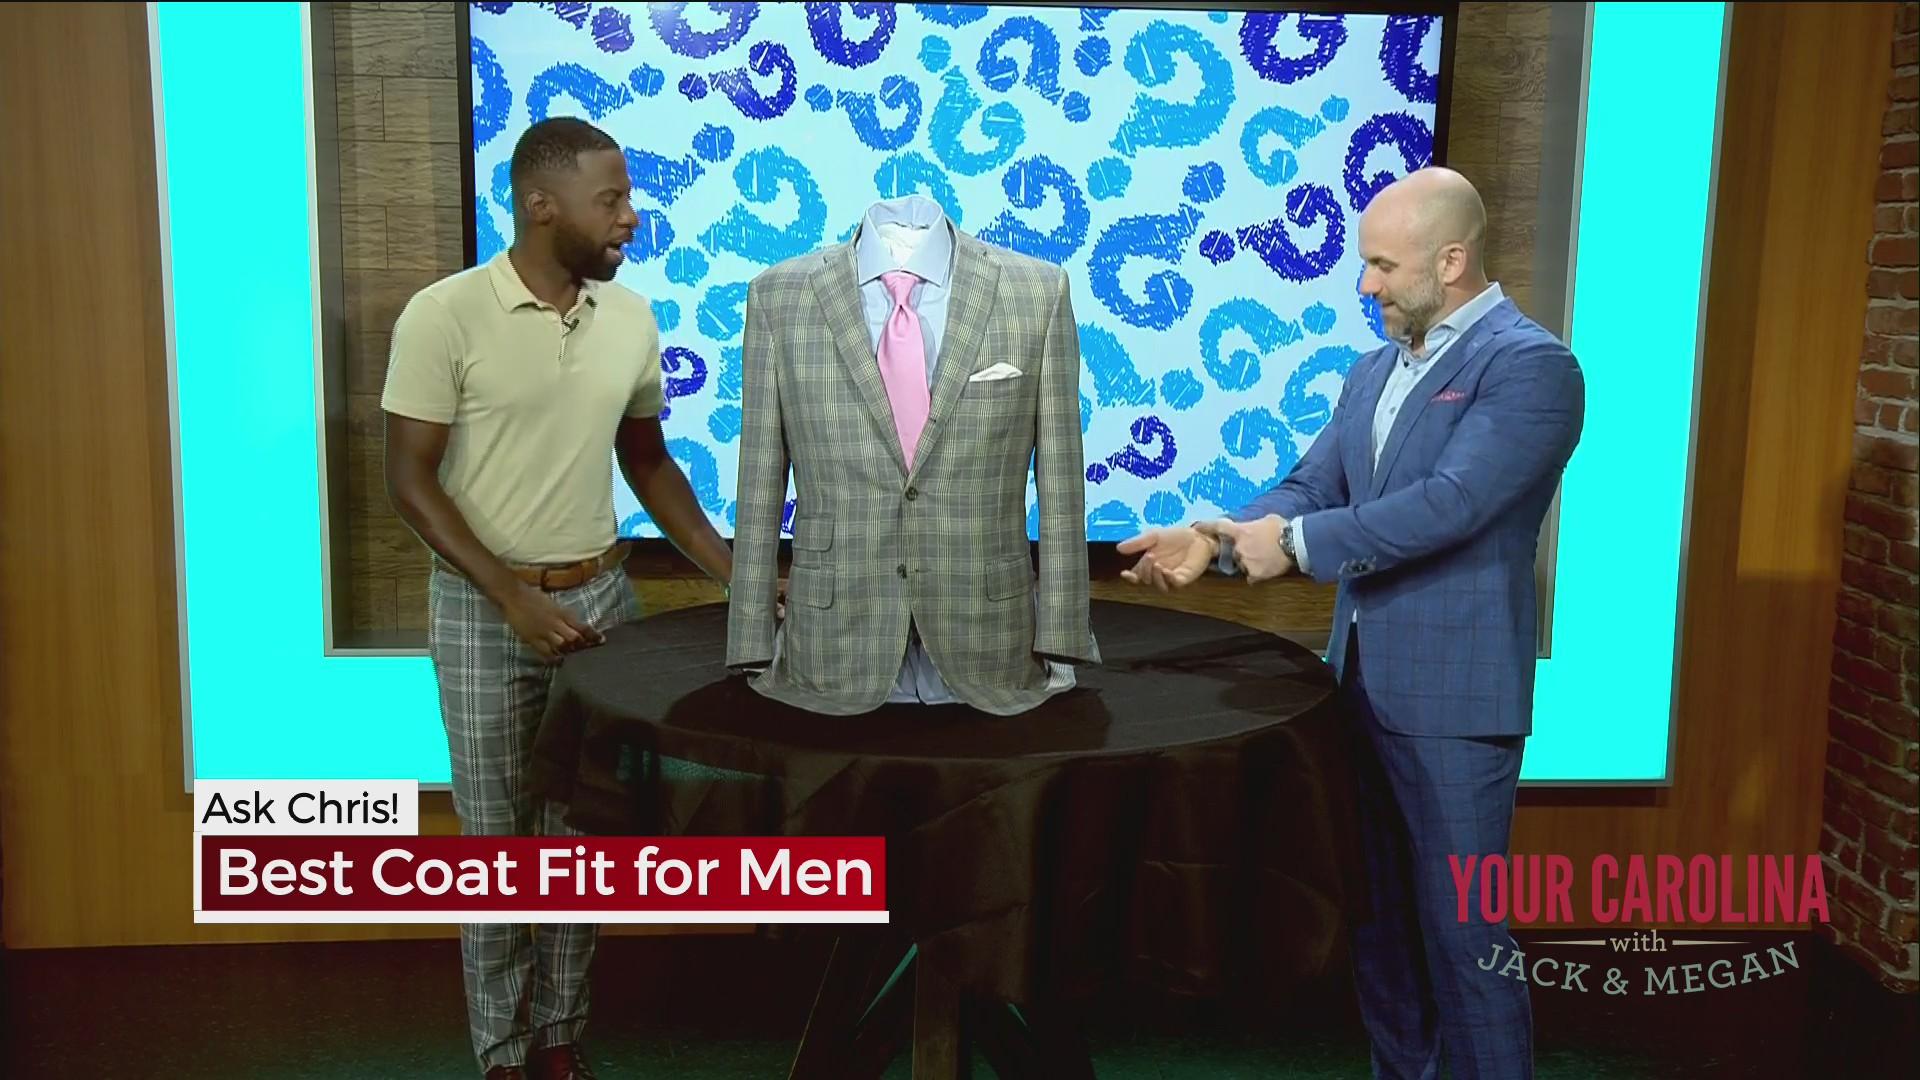 Ask Chris! Best Coat Fit for Men